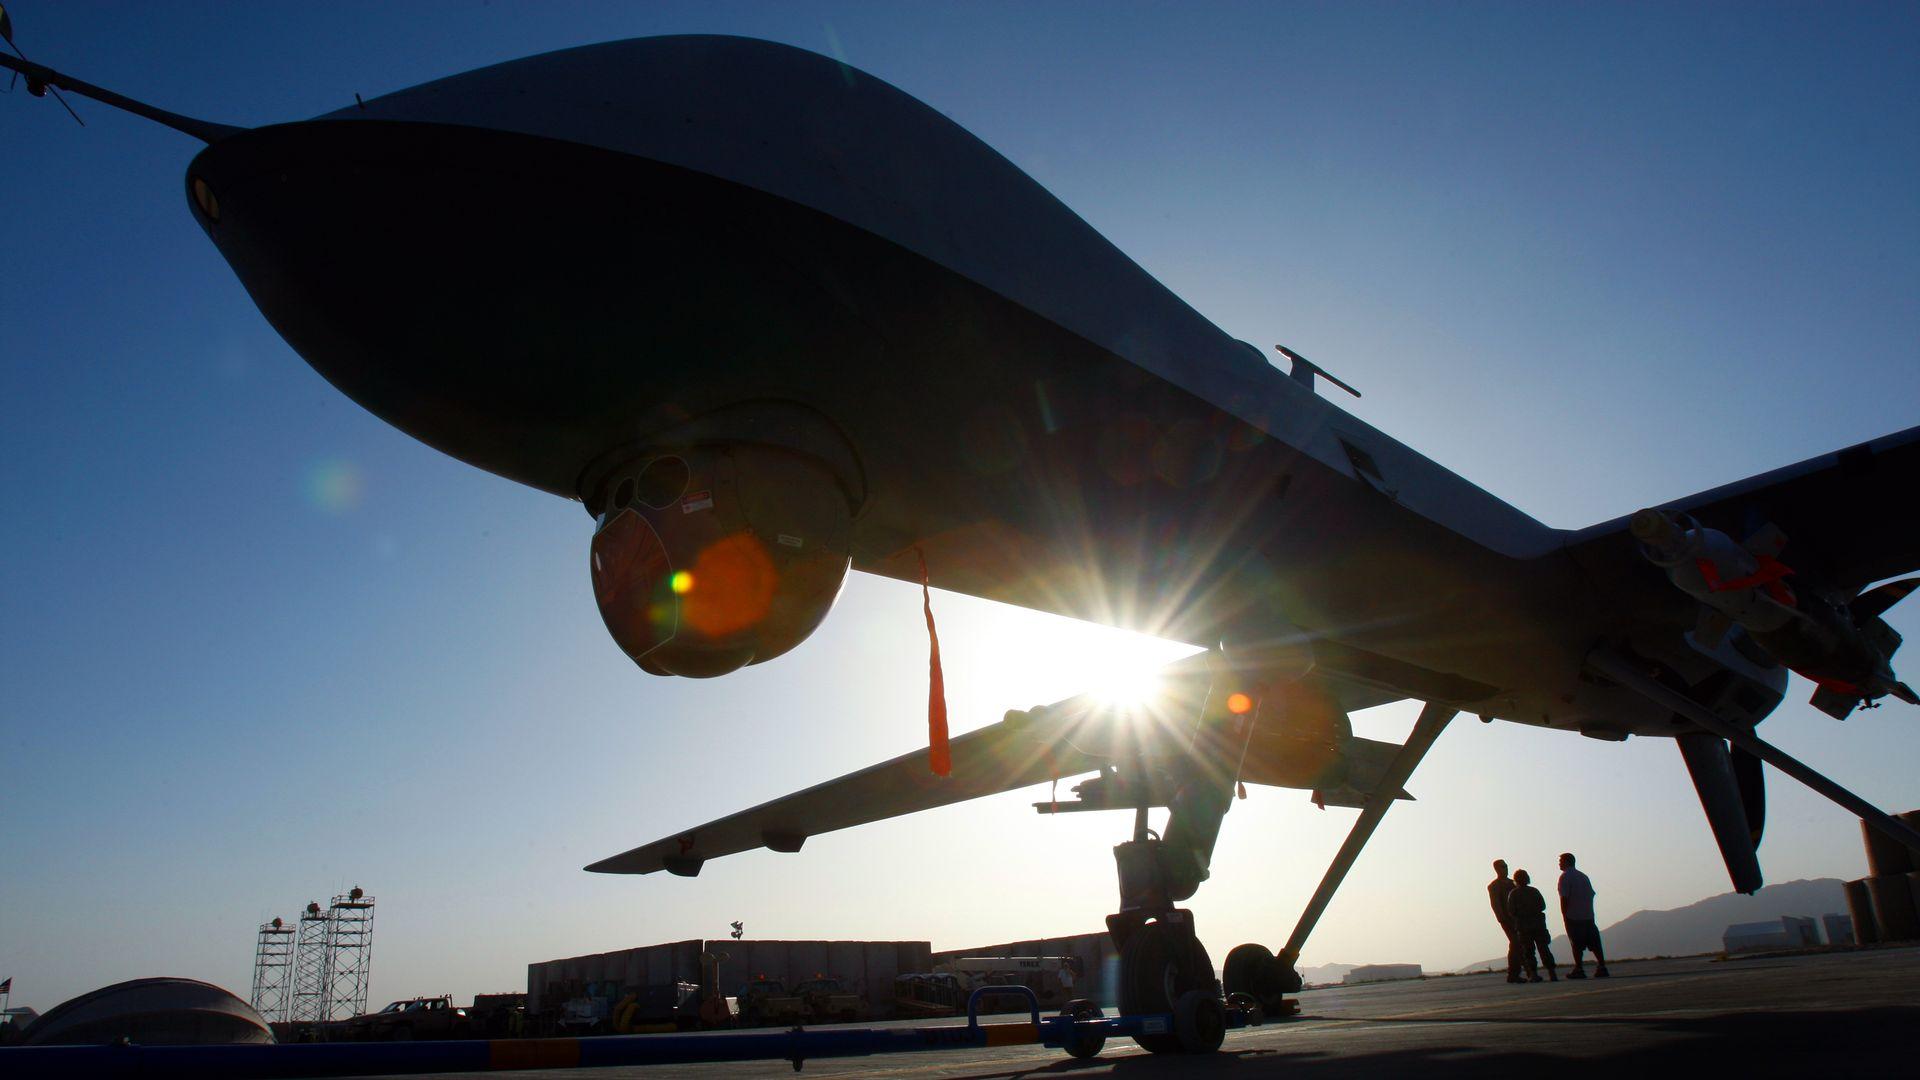 A predator drone on a runway in Kandahar, Afghanistan